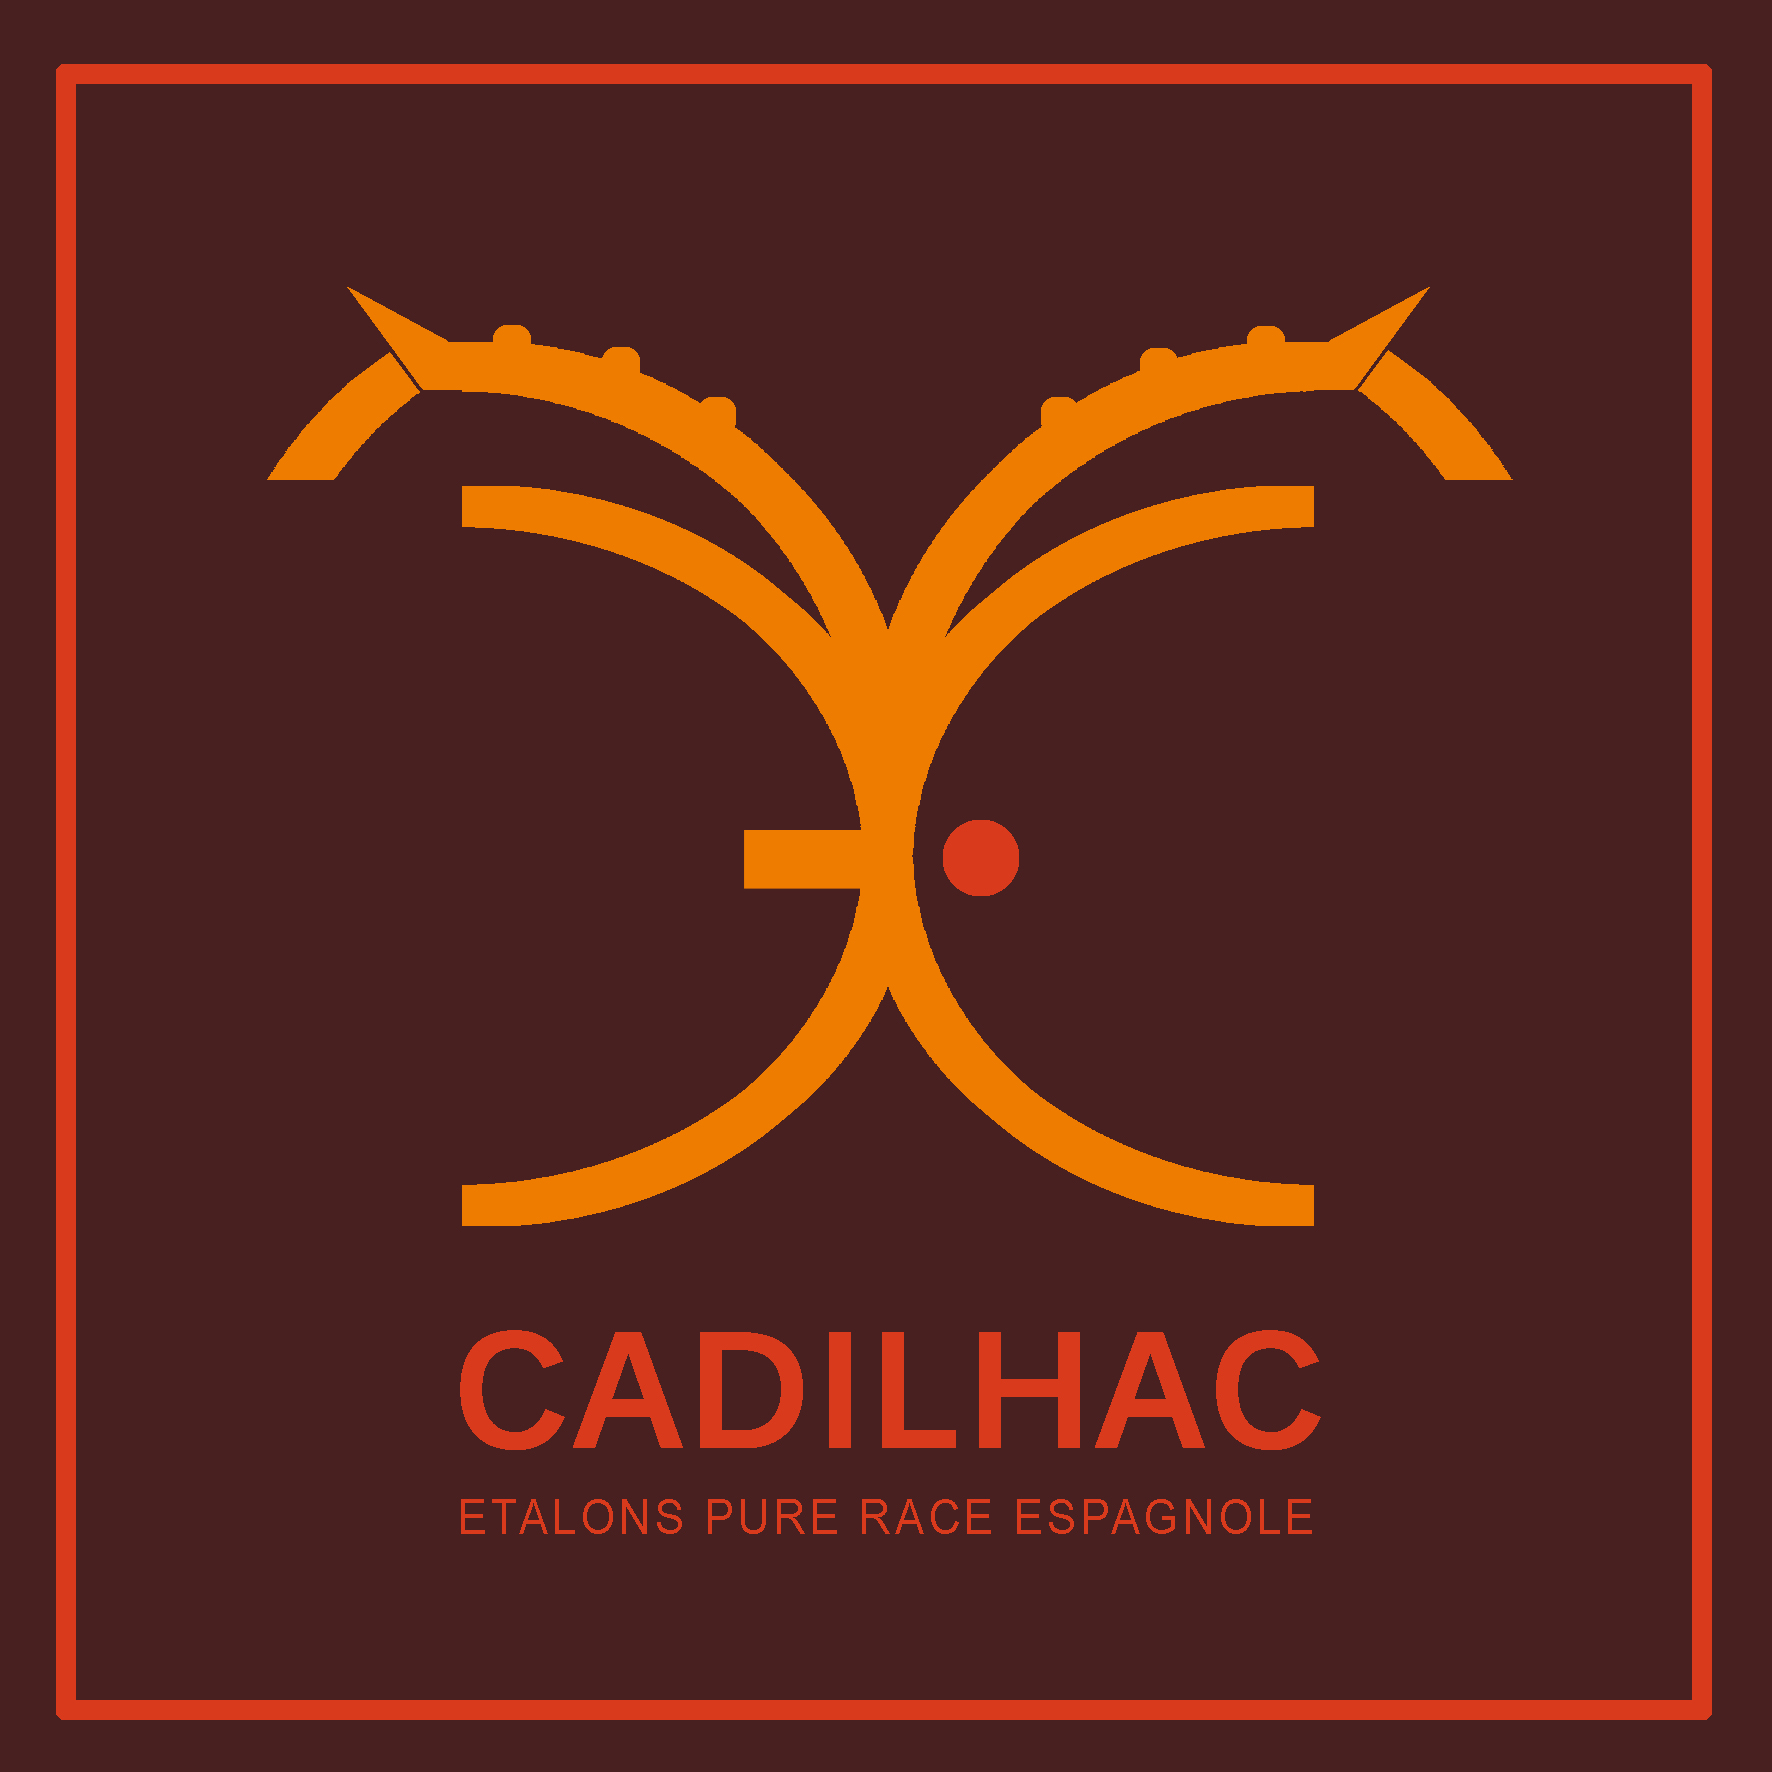 Logo Etalons Cadilhac Brun Cadre